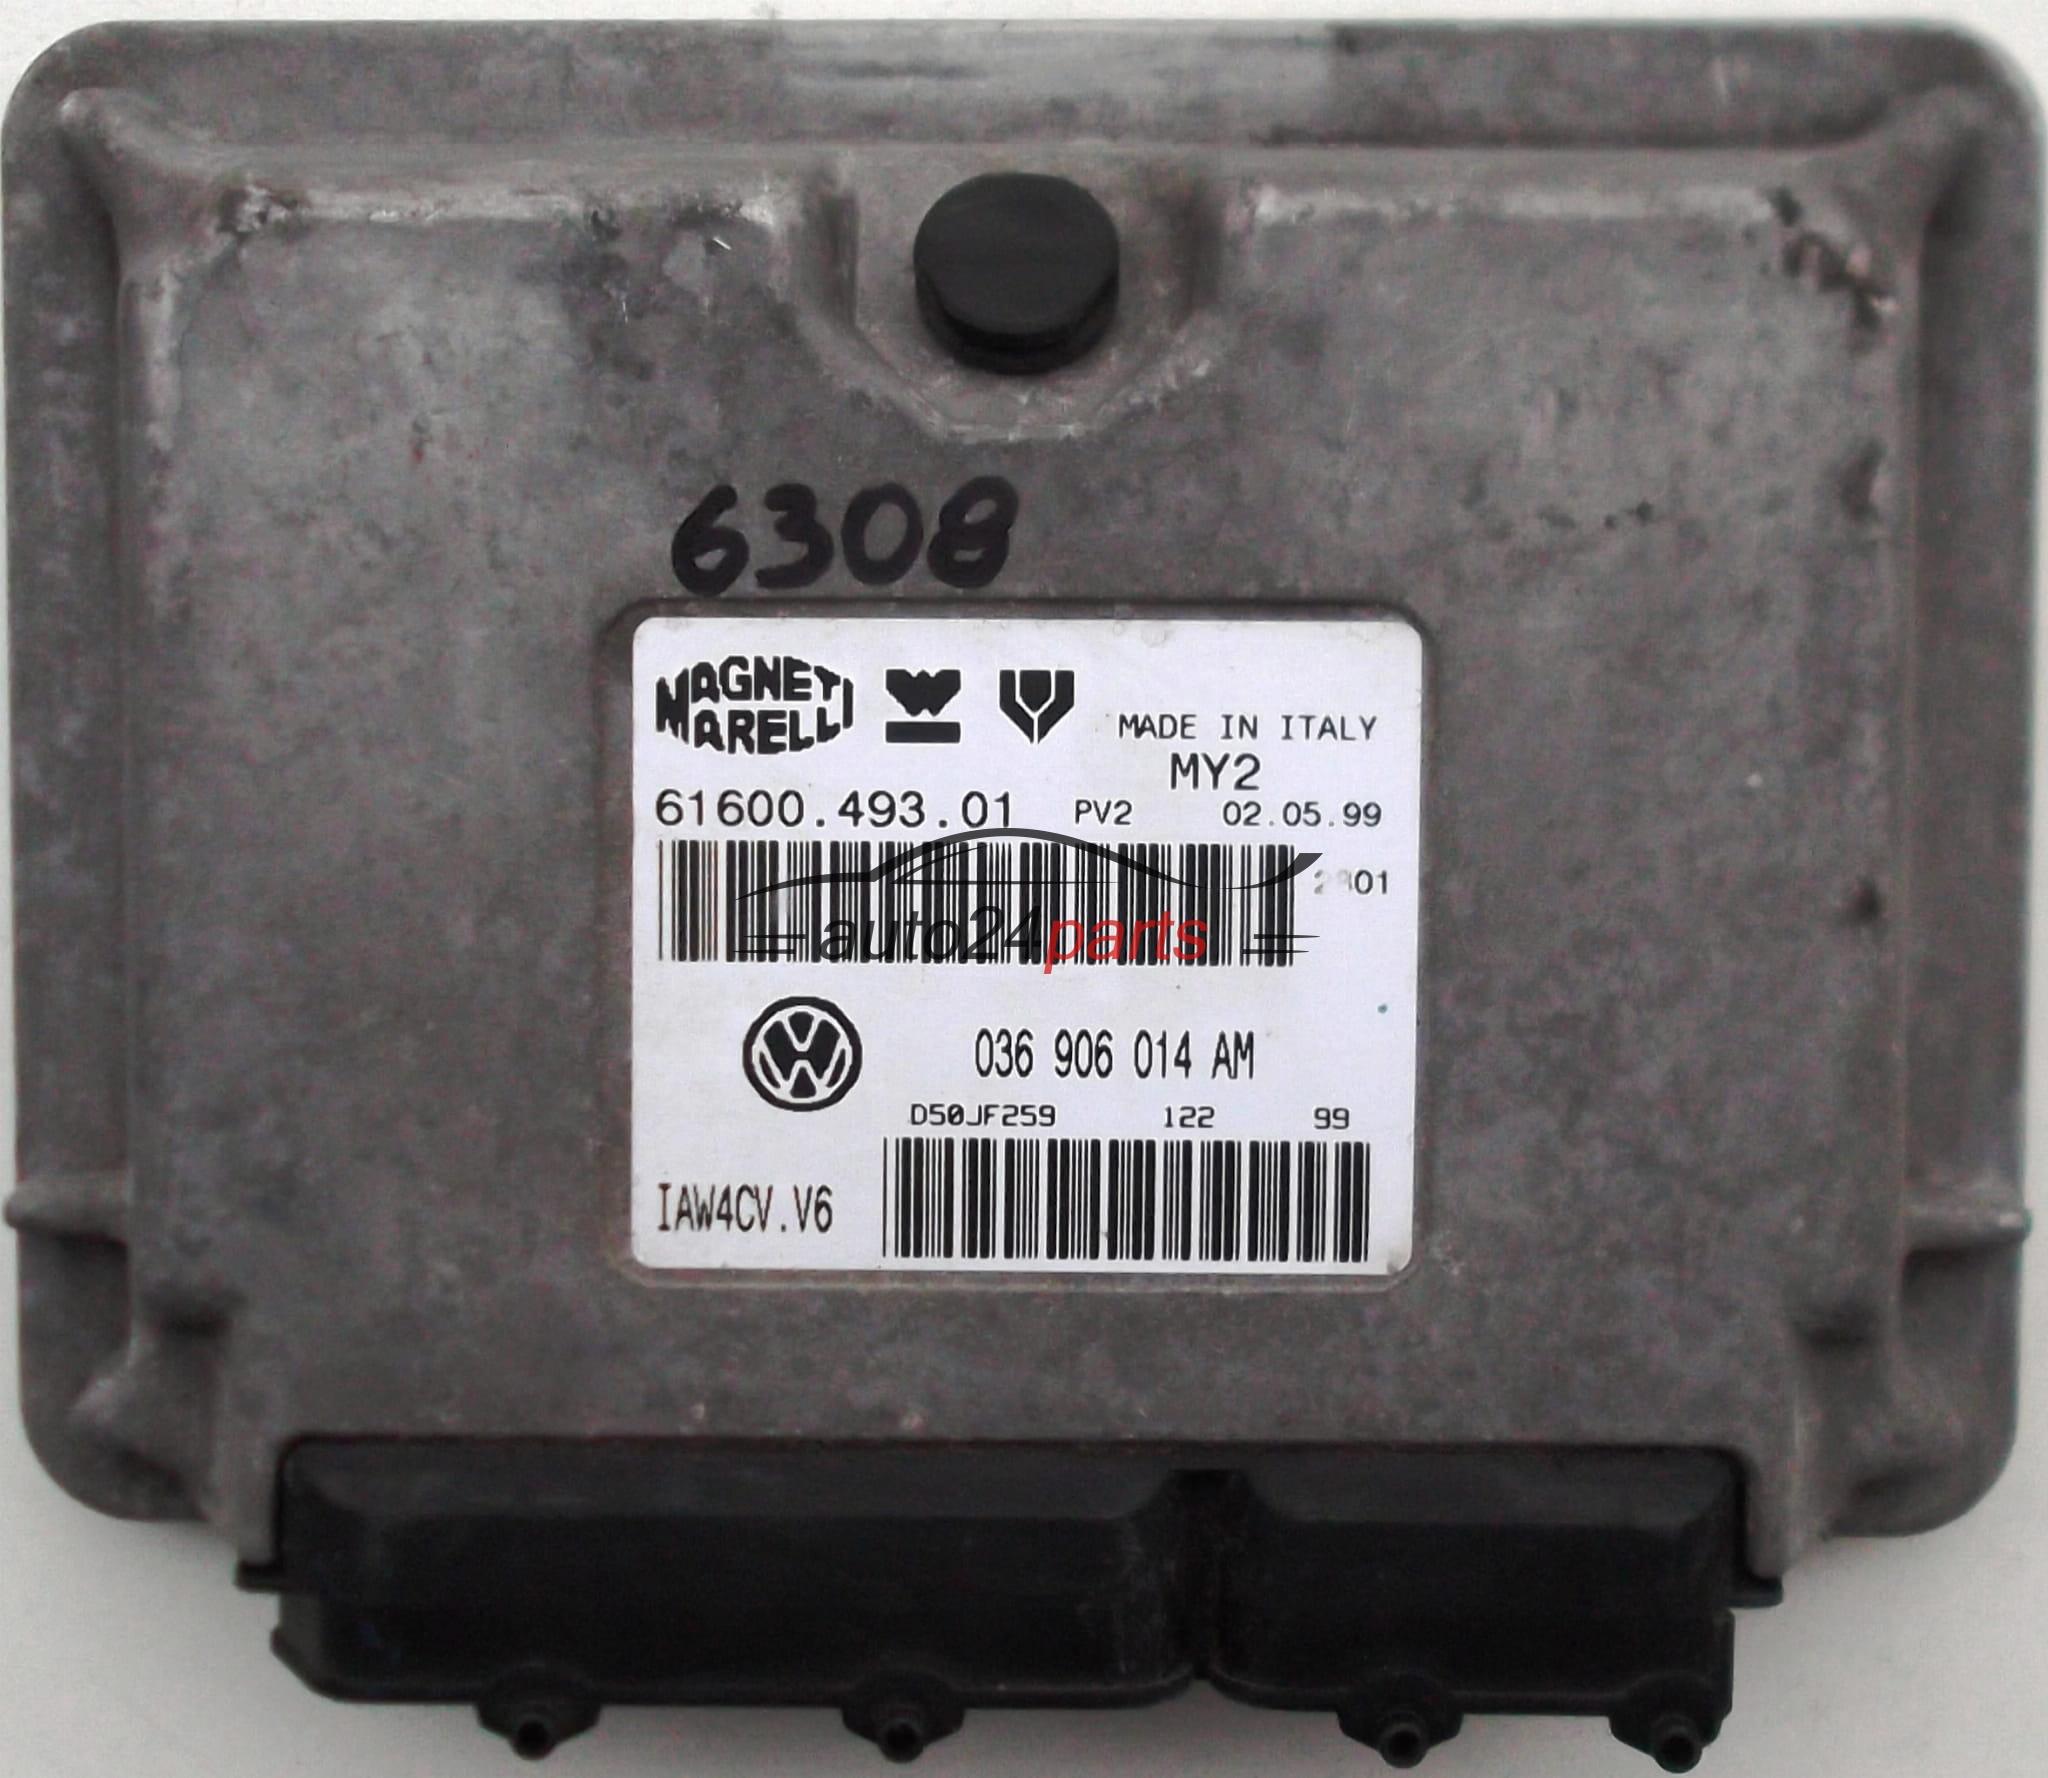 Ecu Engine Controller Vw Volkswagen Lupo 14 036906014am 036 906